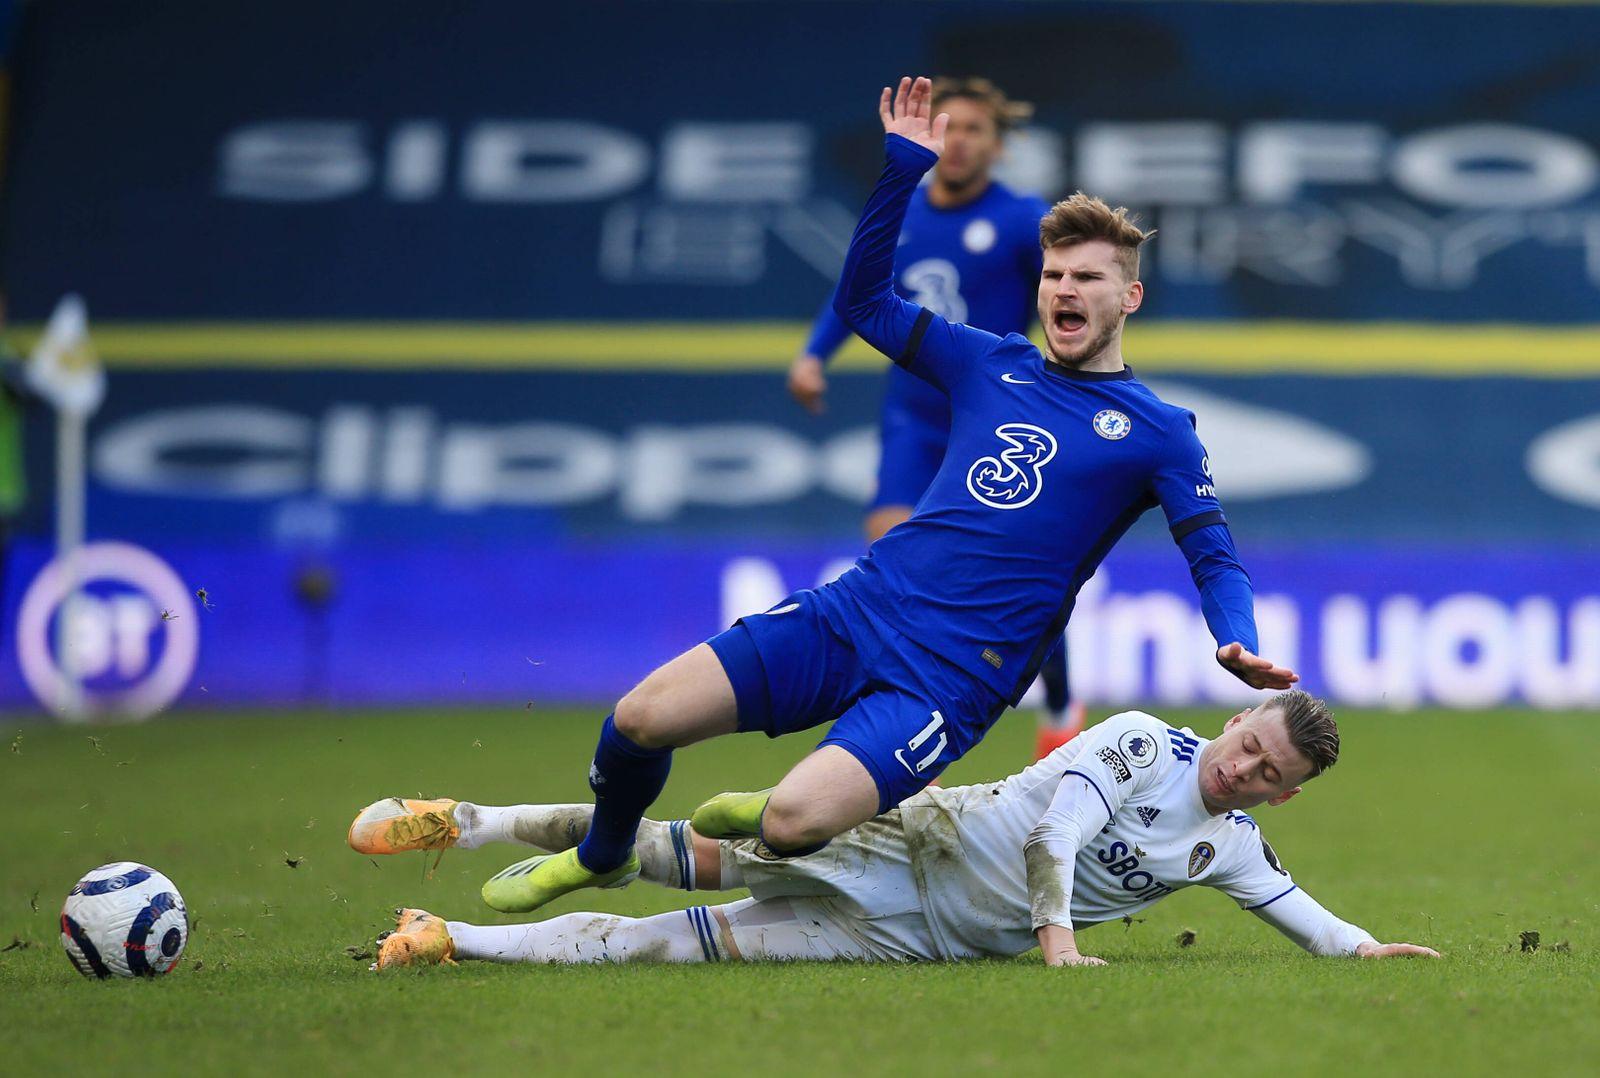 Leeds United v Chelsea - Premier League - Elland Road Leeds United s Ezgjan Alioski challenges Chelsea s Timo Werner dur